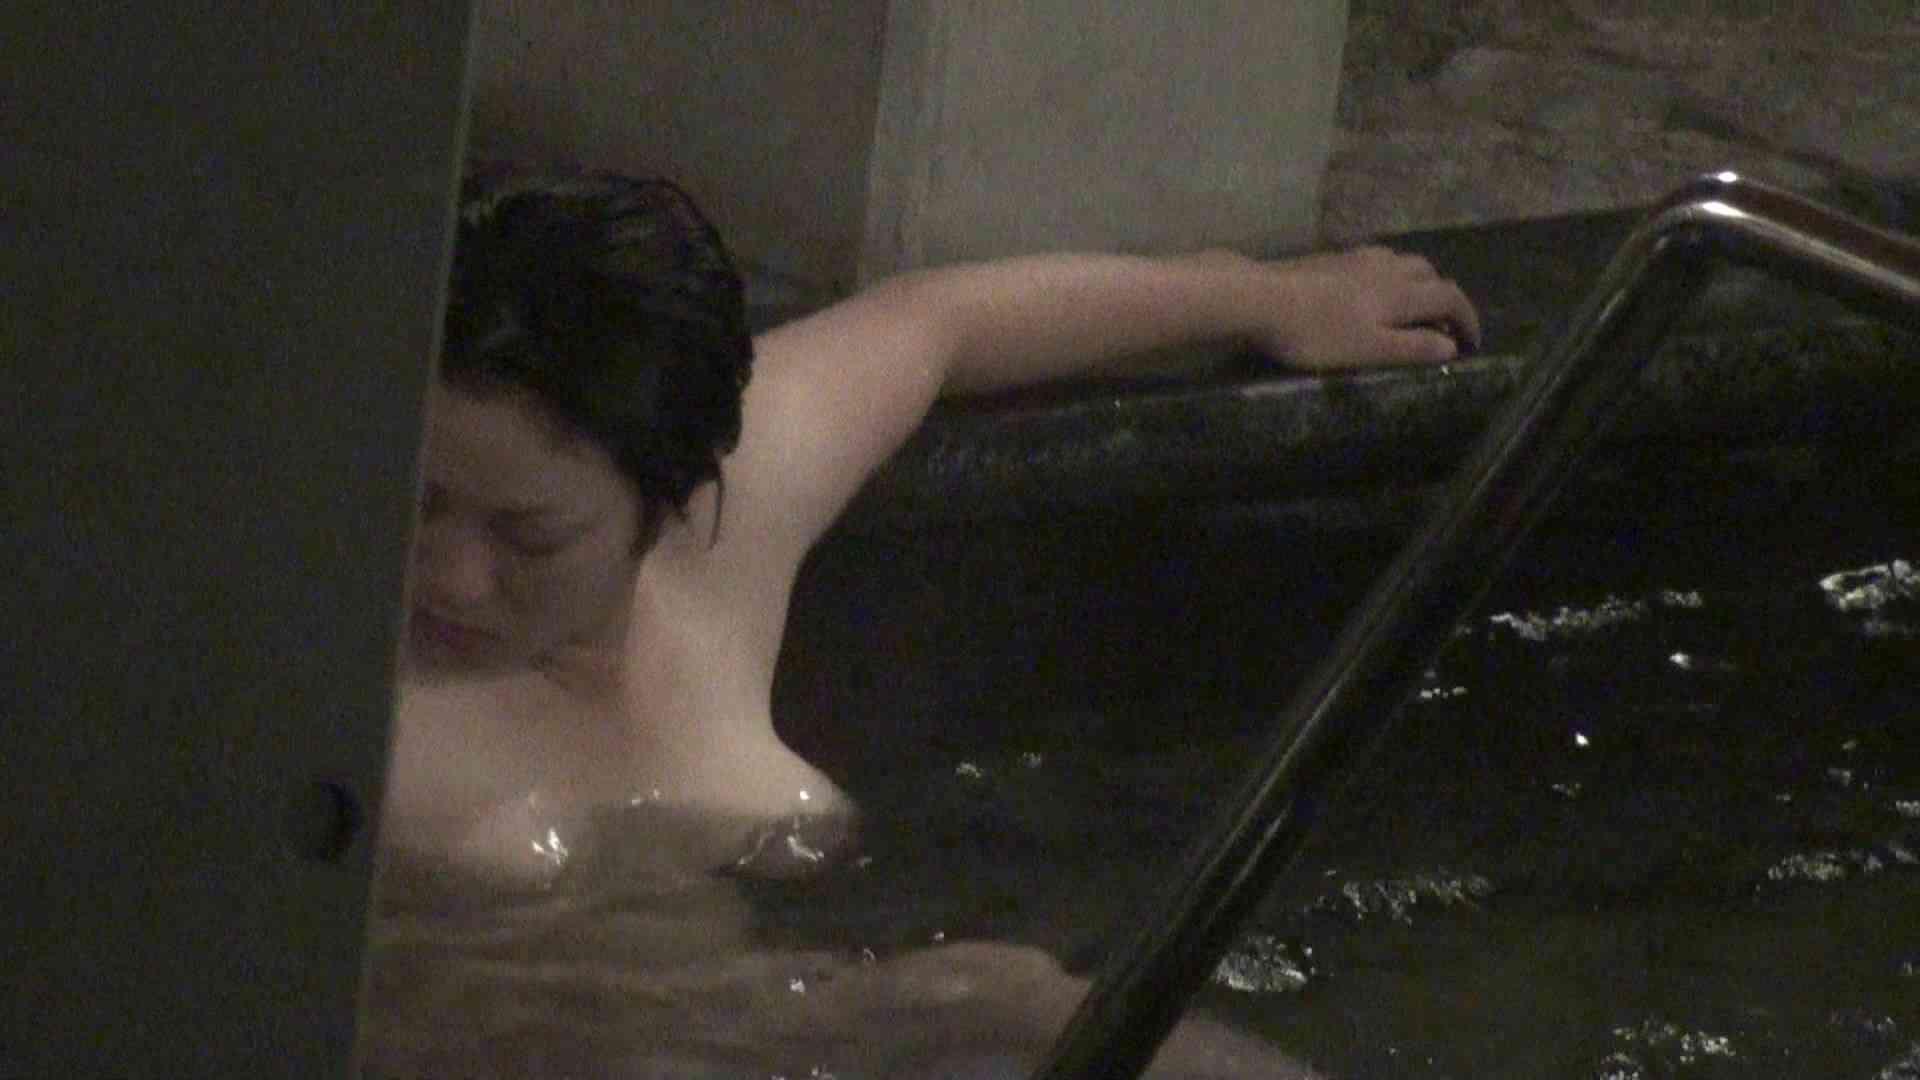 Aquaな露天風呂Vol.338 露天 AV動画キャプチャ 101pic 59